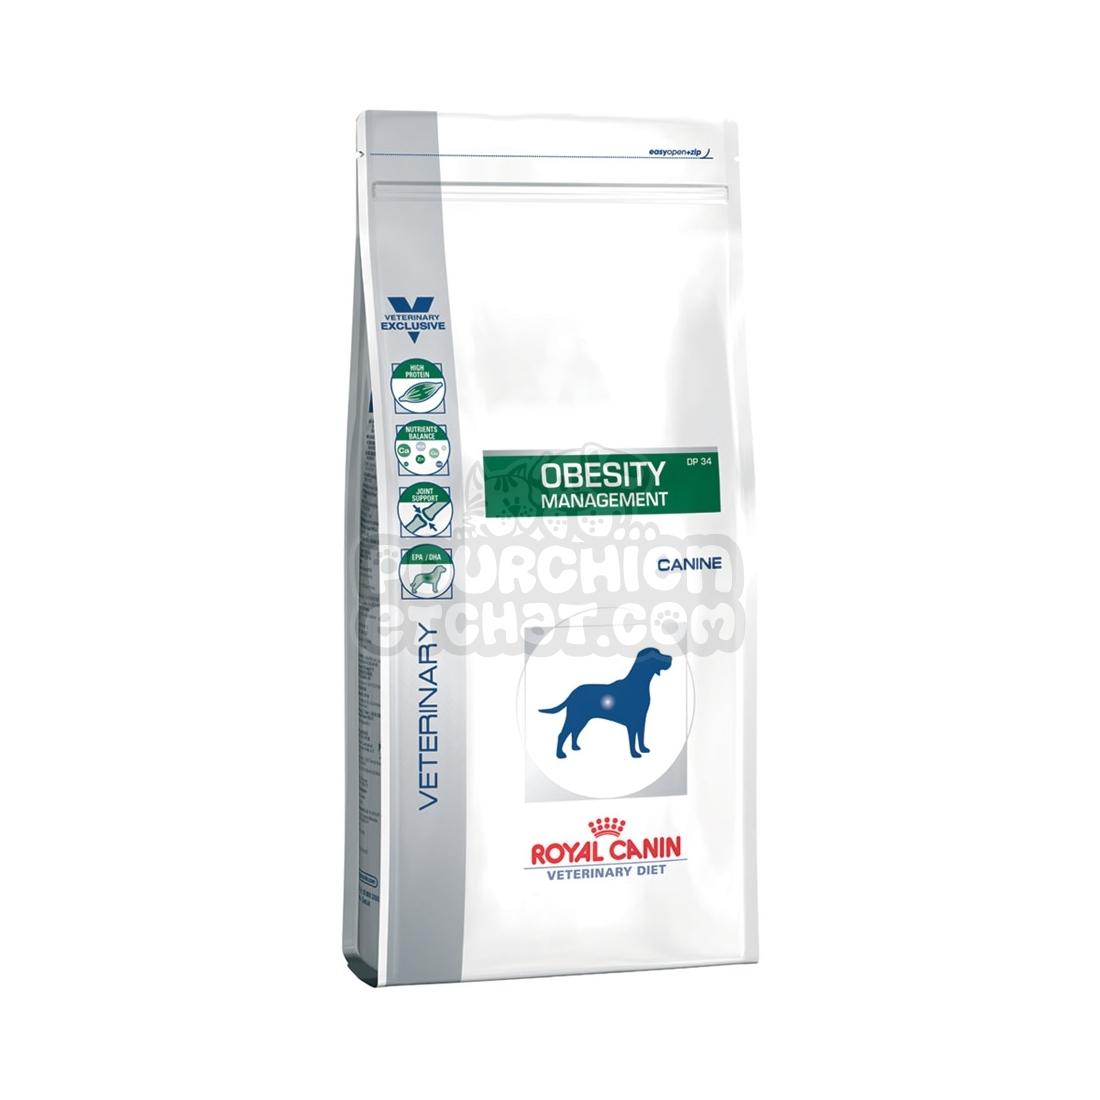 royal canin veterinary diet chien obesity management dp 34. Black Bedroom Furniture Sets. Home Design Ideas